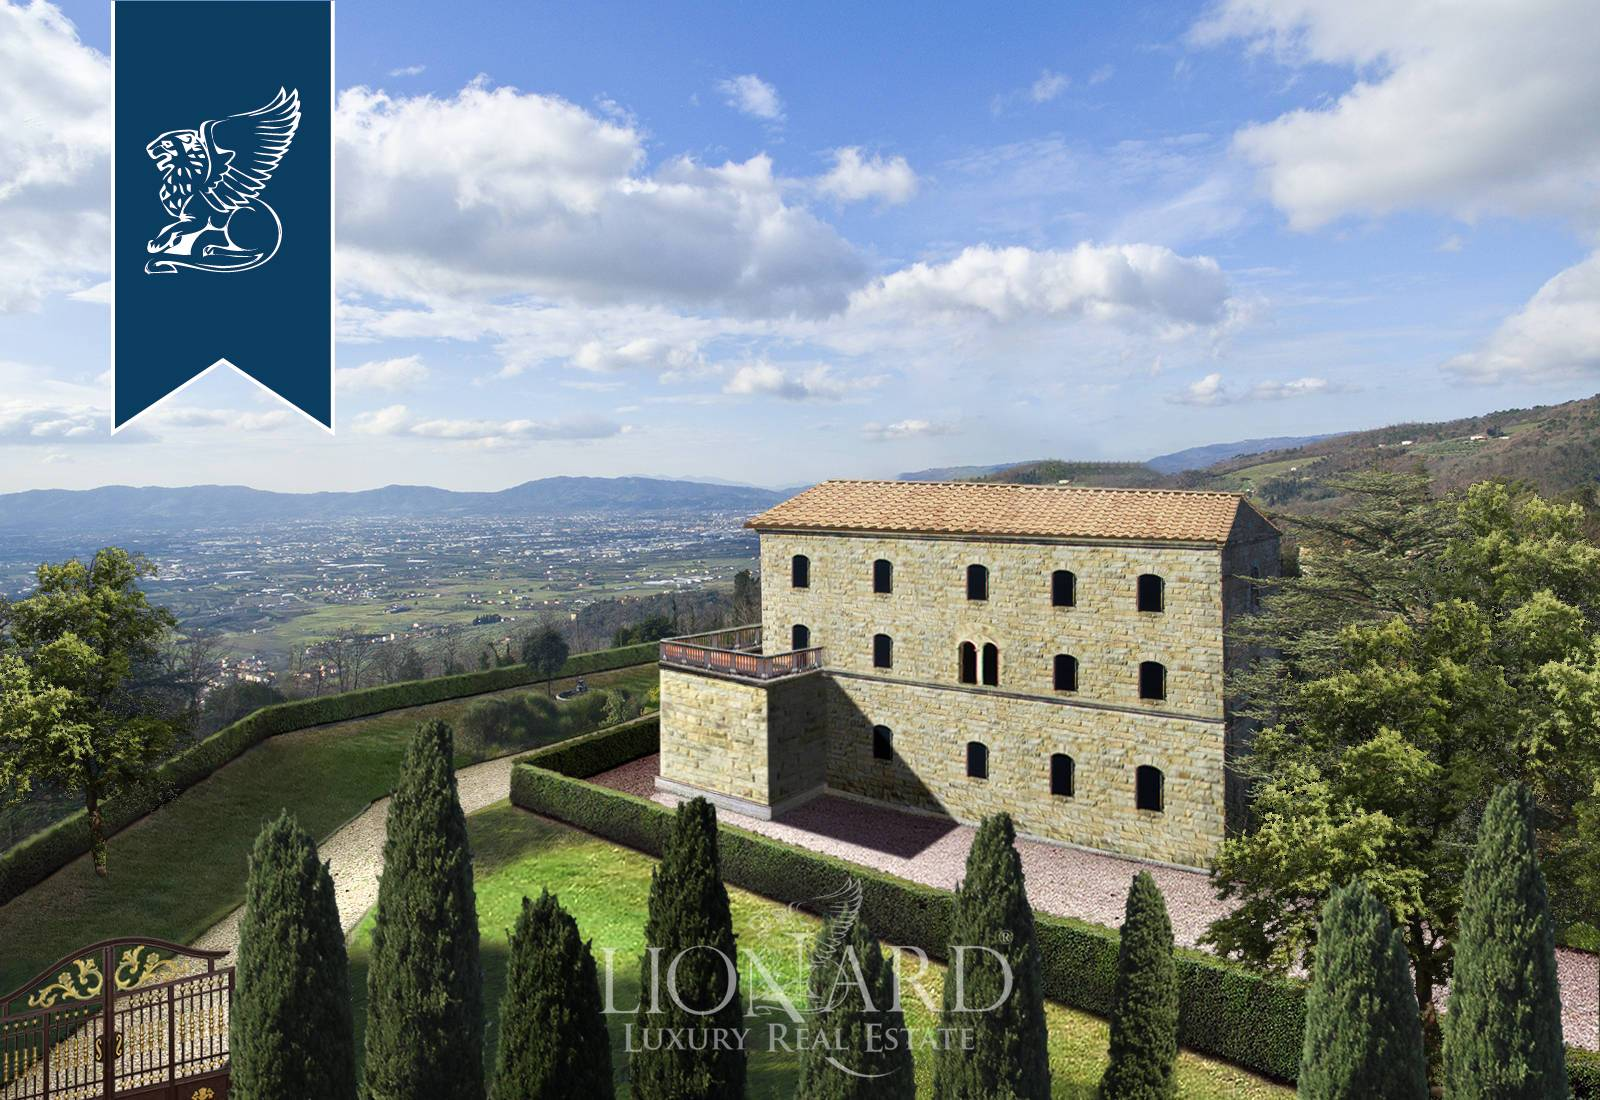 Azienda in Vendita a Montale: 0 locali, 4135 mq - Foto 4